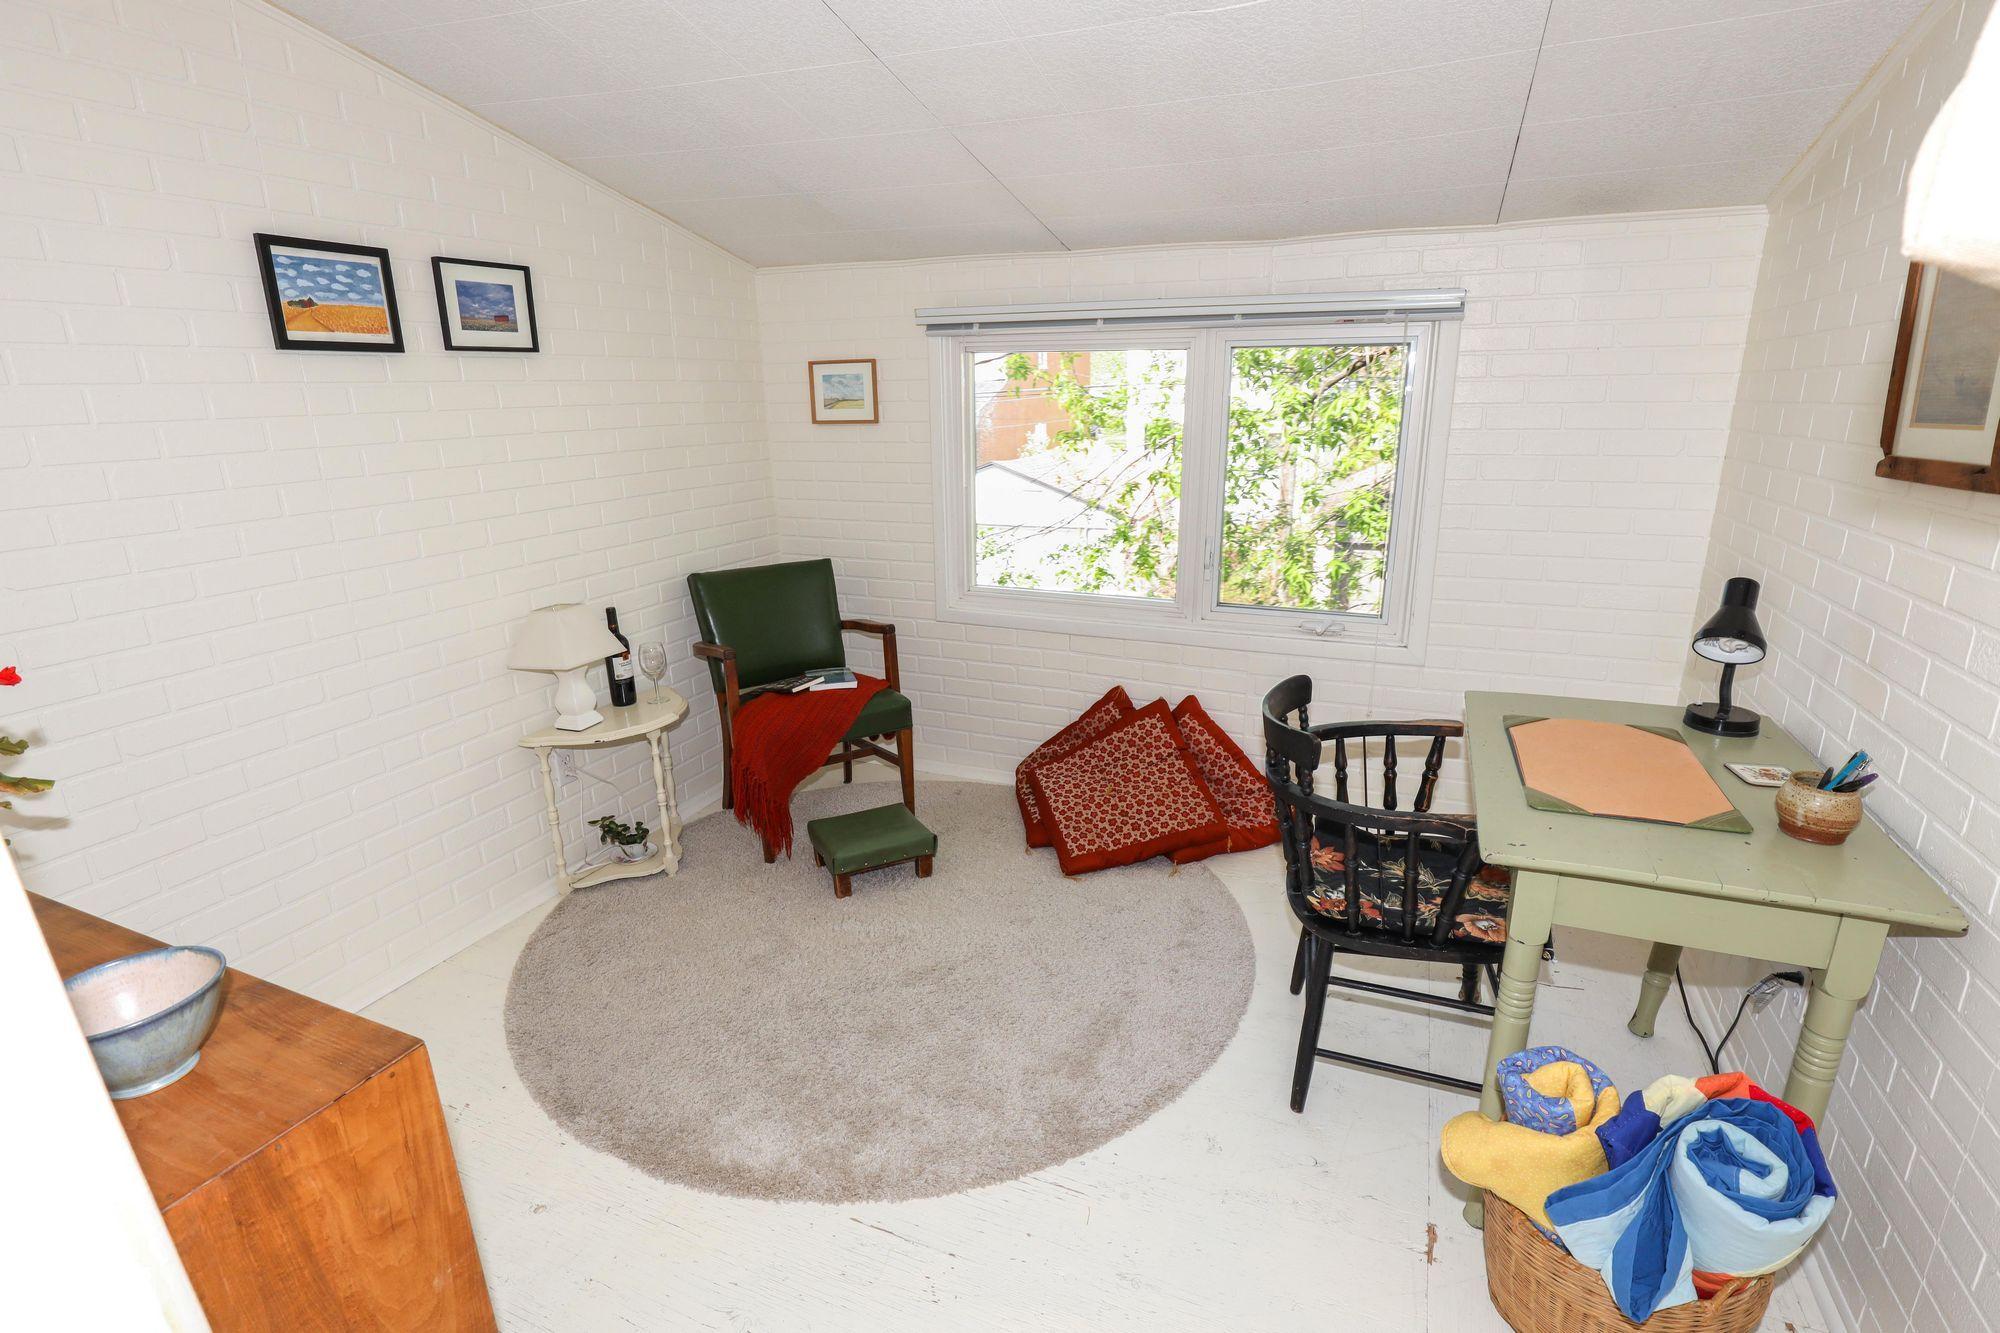 Photo 25: Photos: 110 Lipton in Winnipeg: Wolseley Single Family Detached for sale (5B)  : MLS®# 202111593